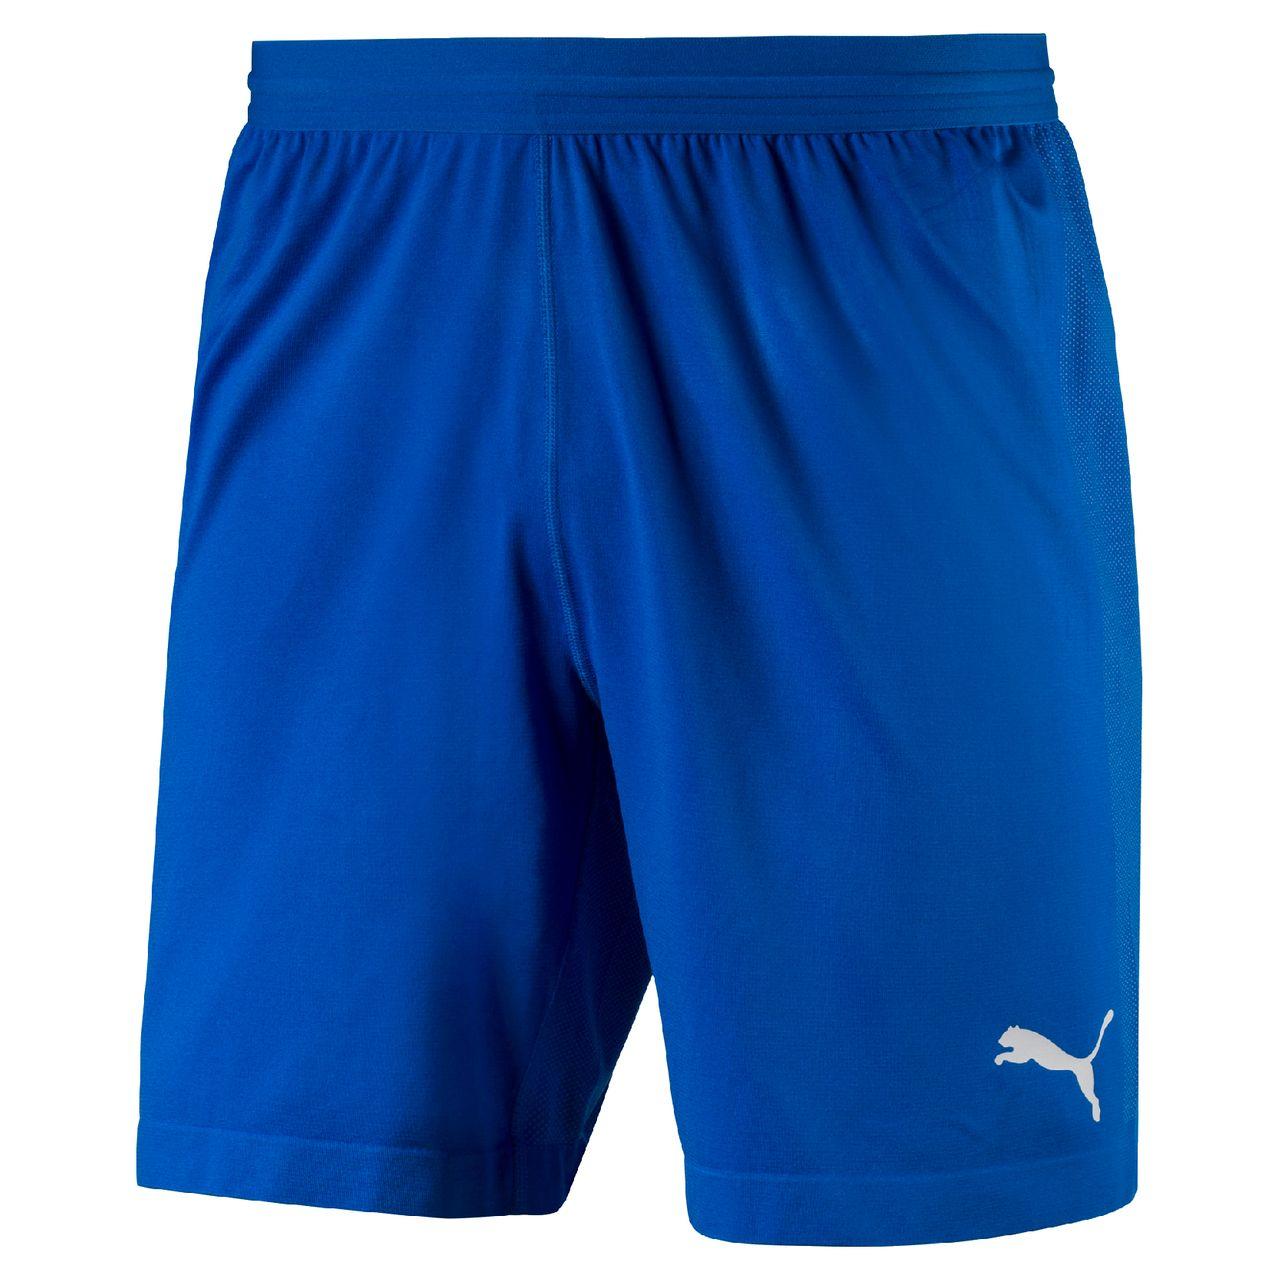 PUMA FINAL evoKNIT Shorts